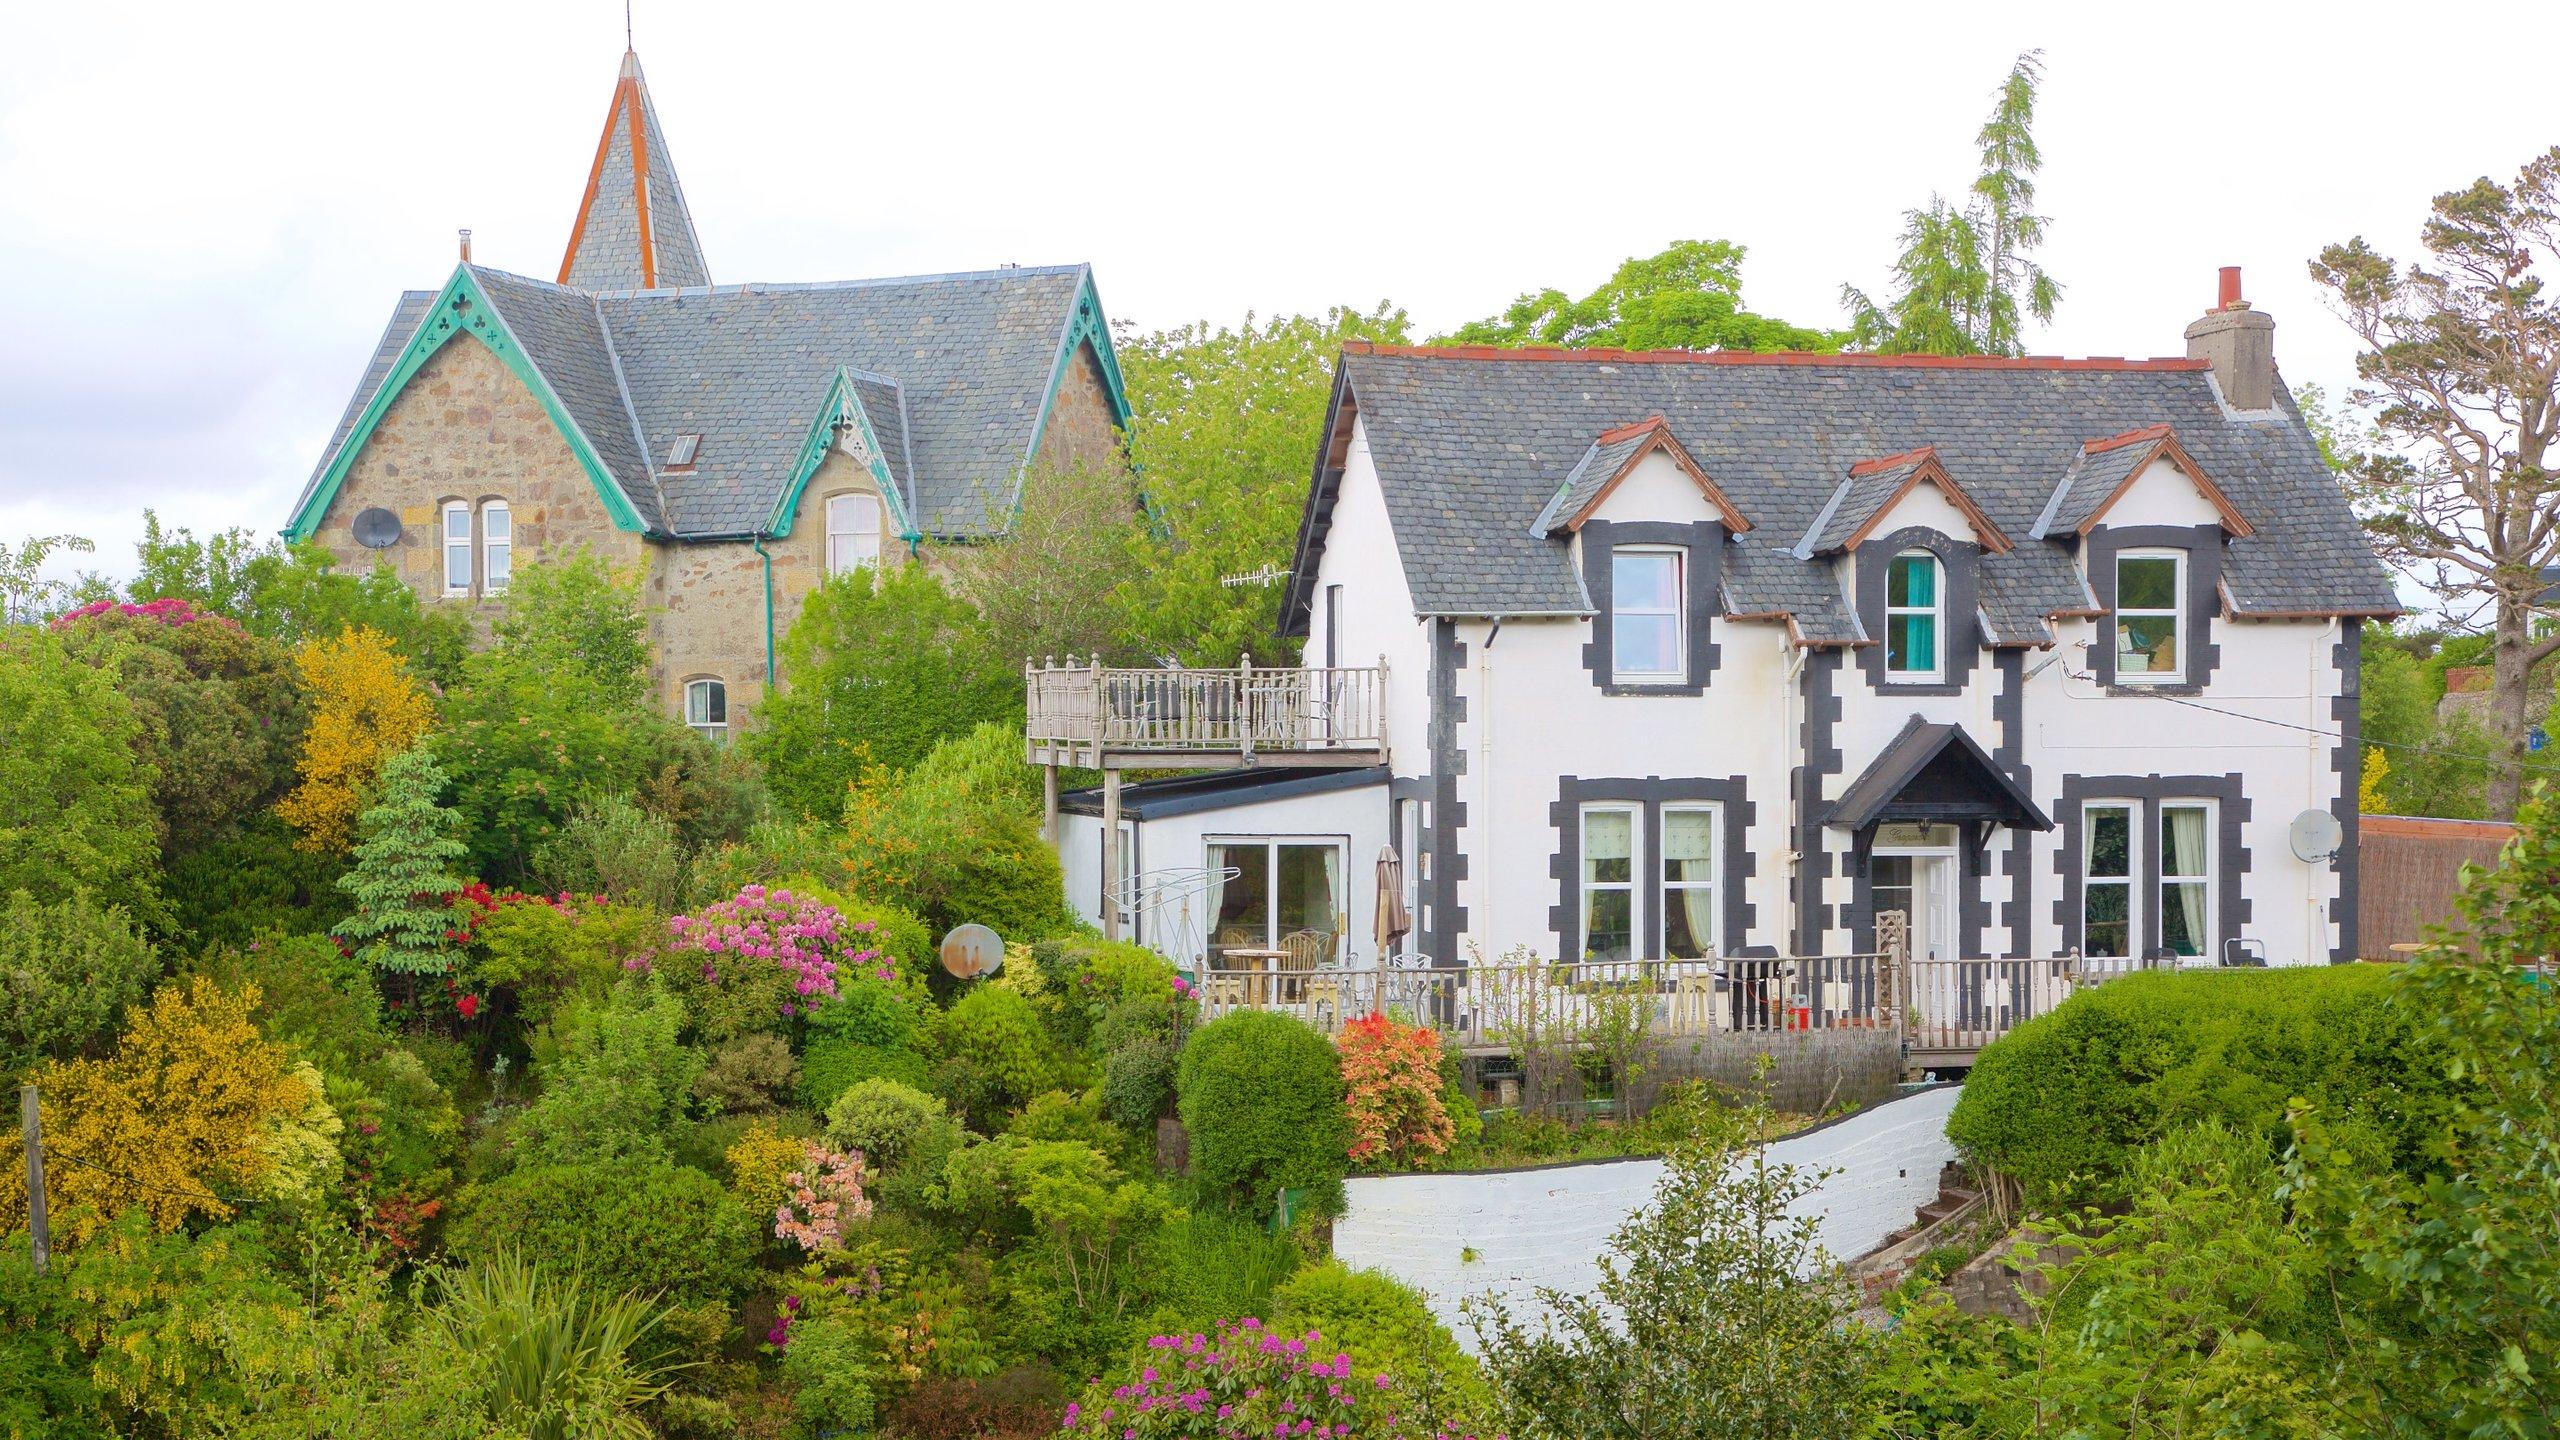 Argyll and Bute, Scotland, United Kingdom